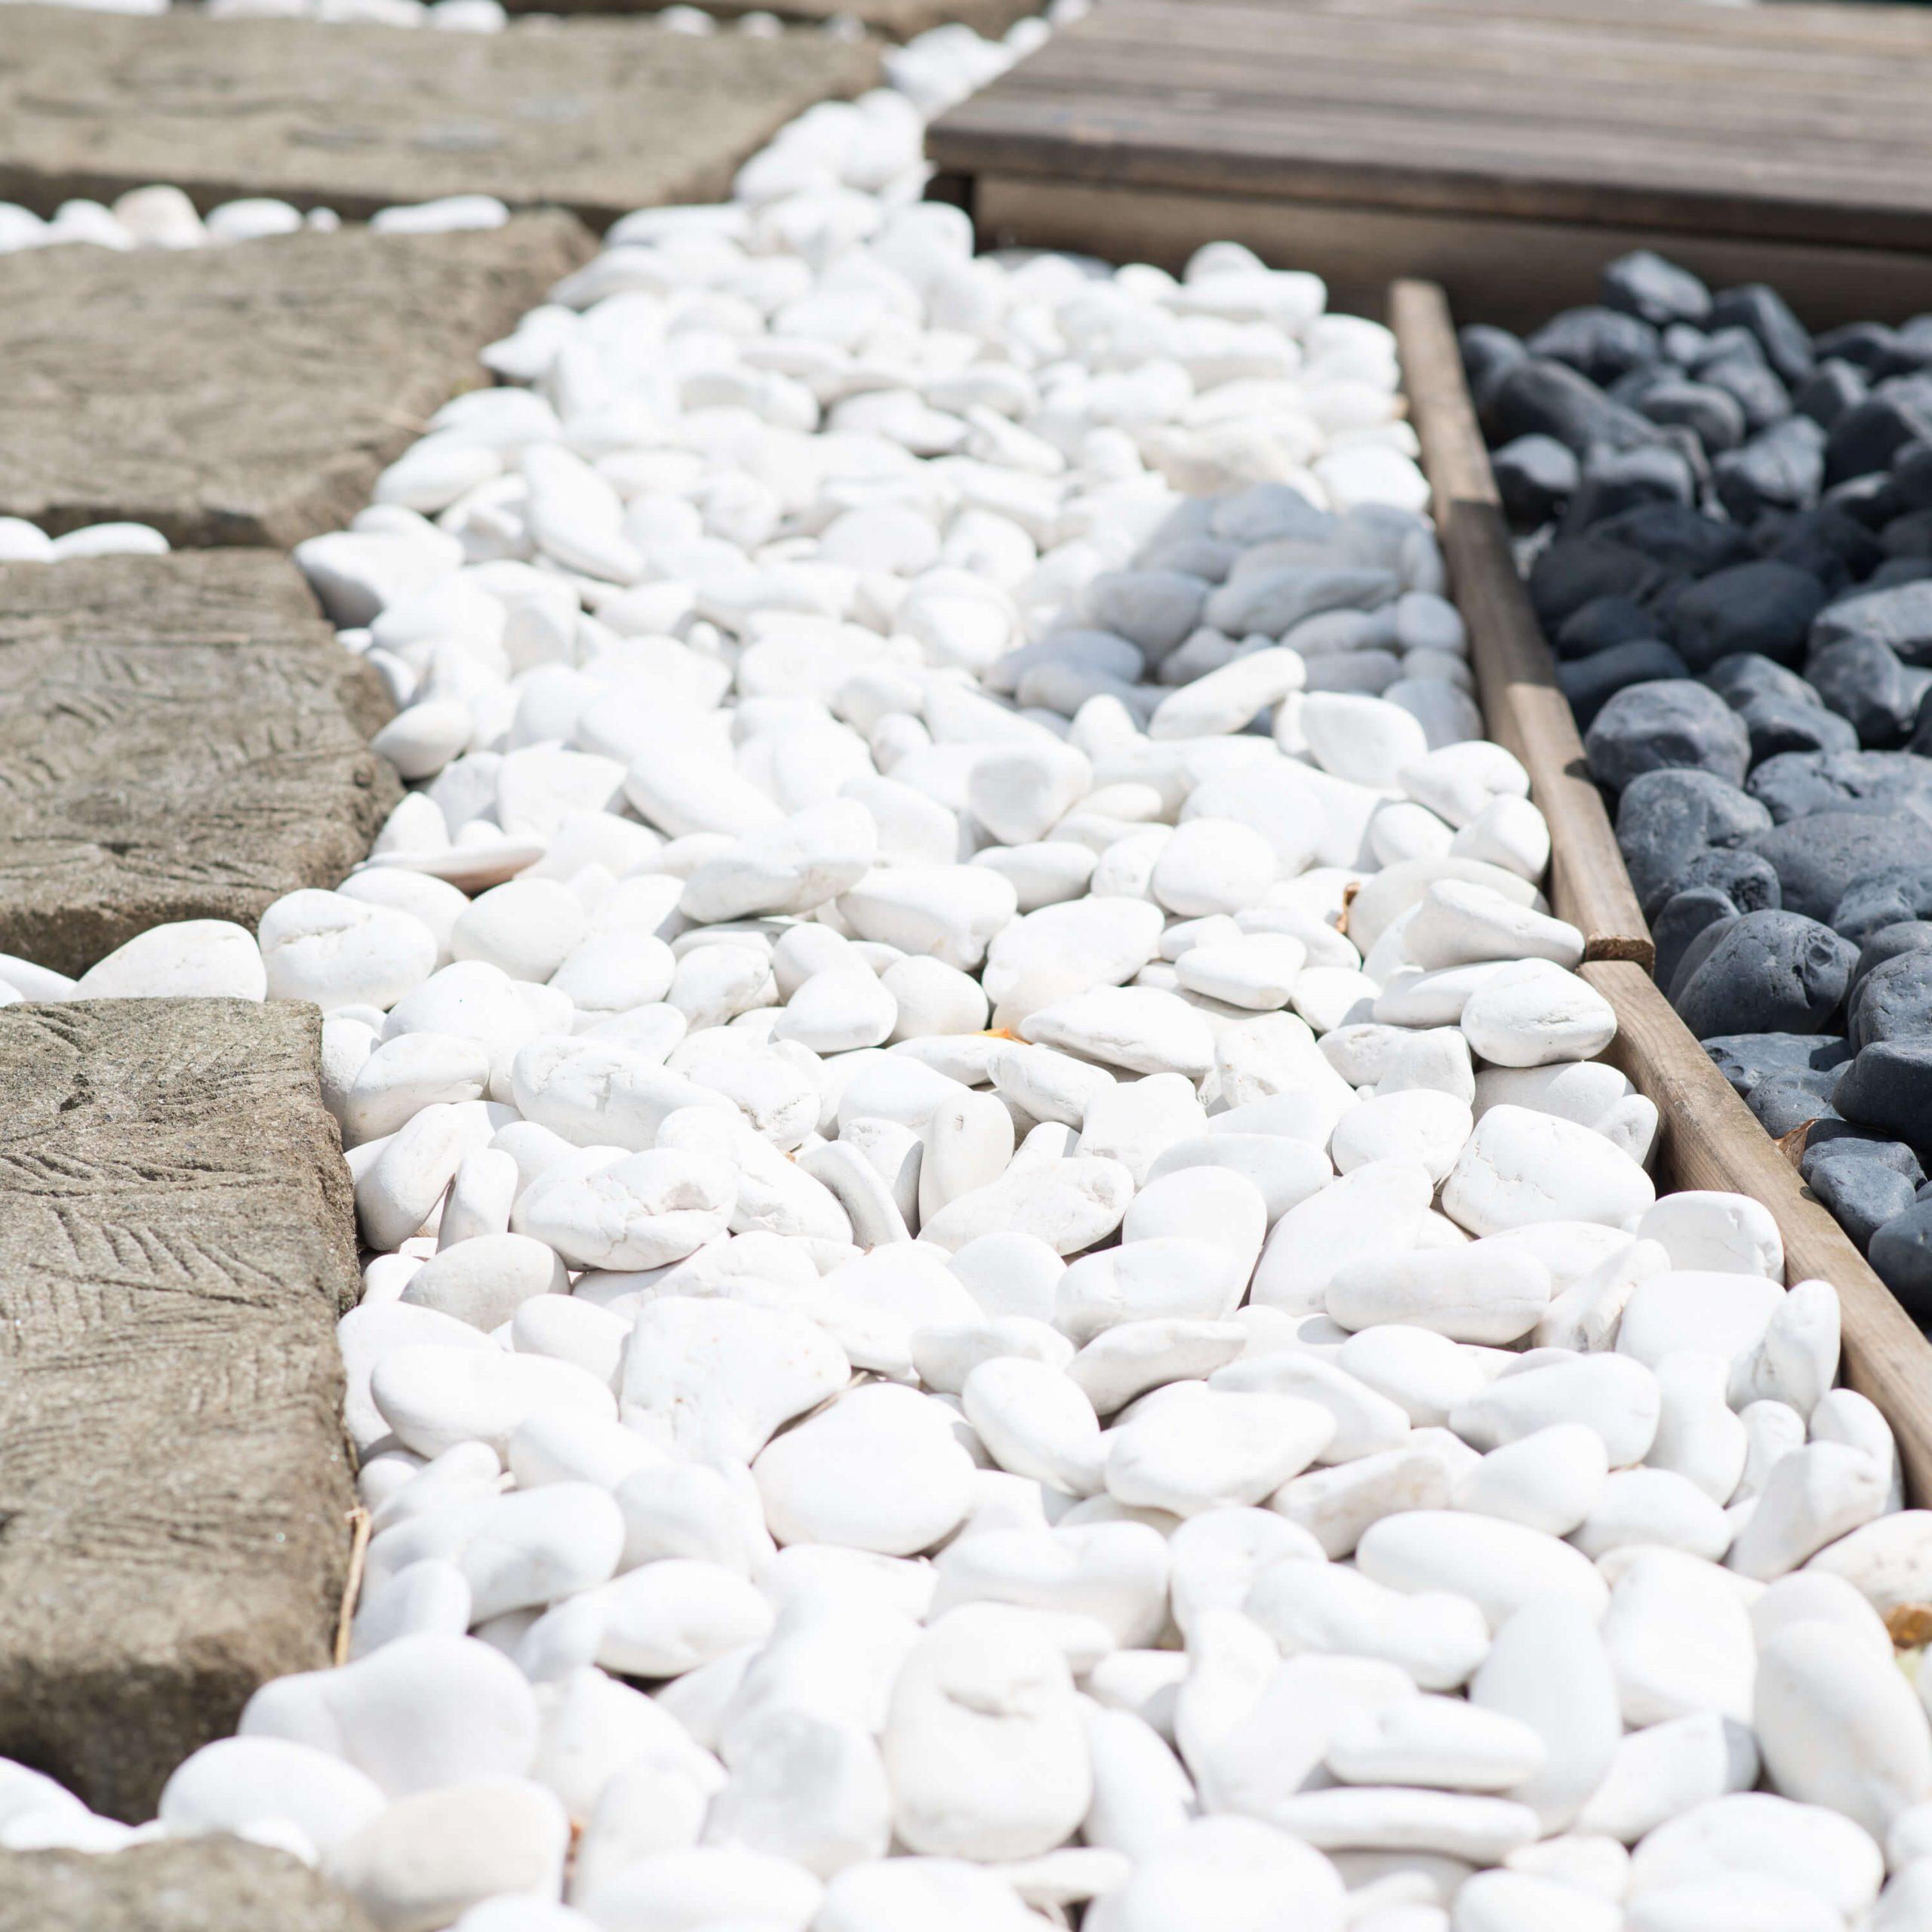 5 Sacs De Galet Blanc De 10Kg concernant Galet Blanc Jardin